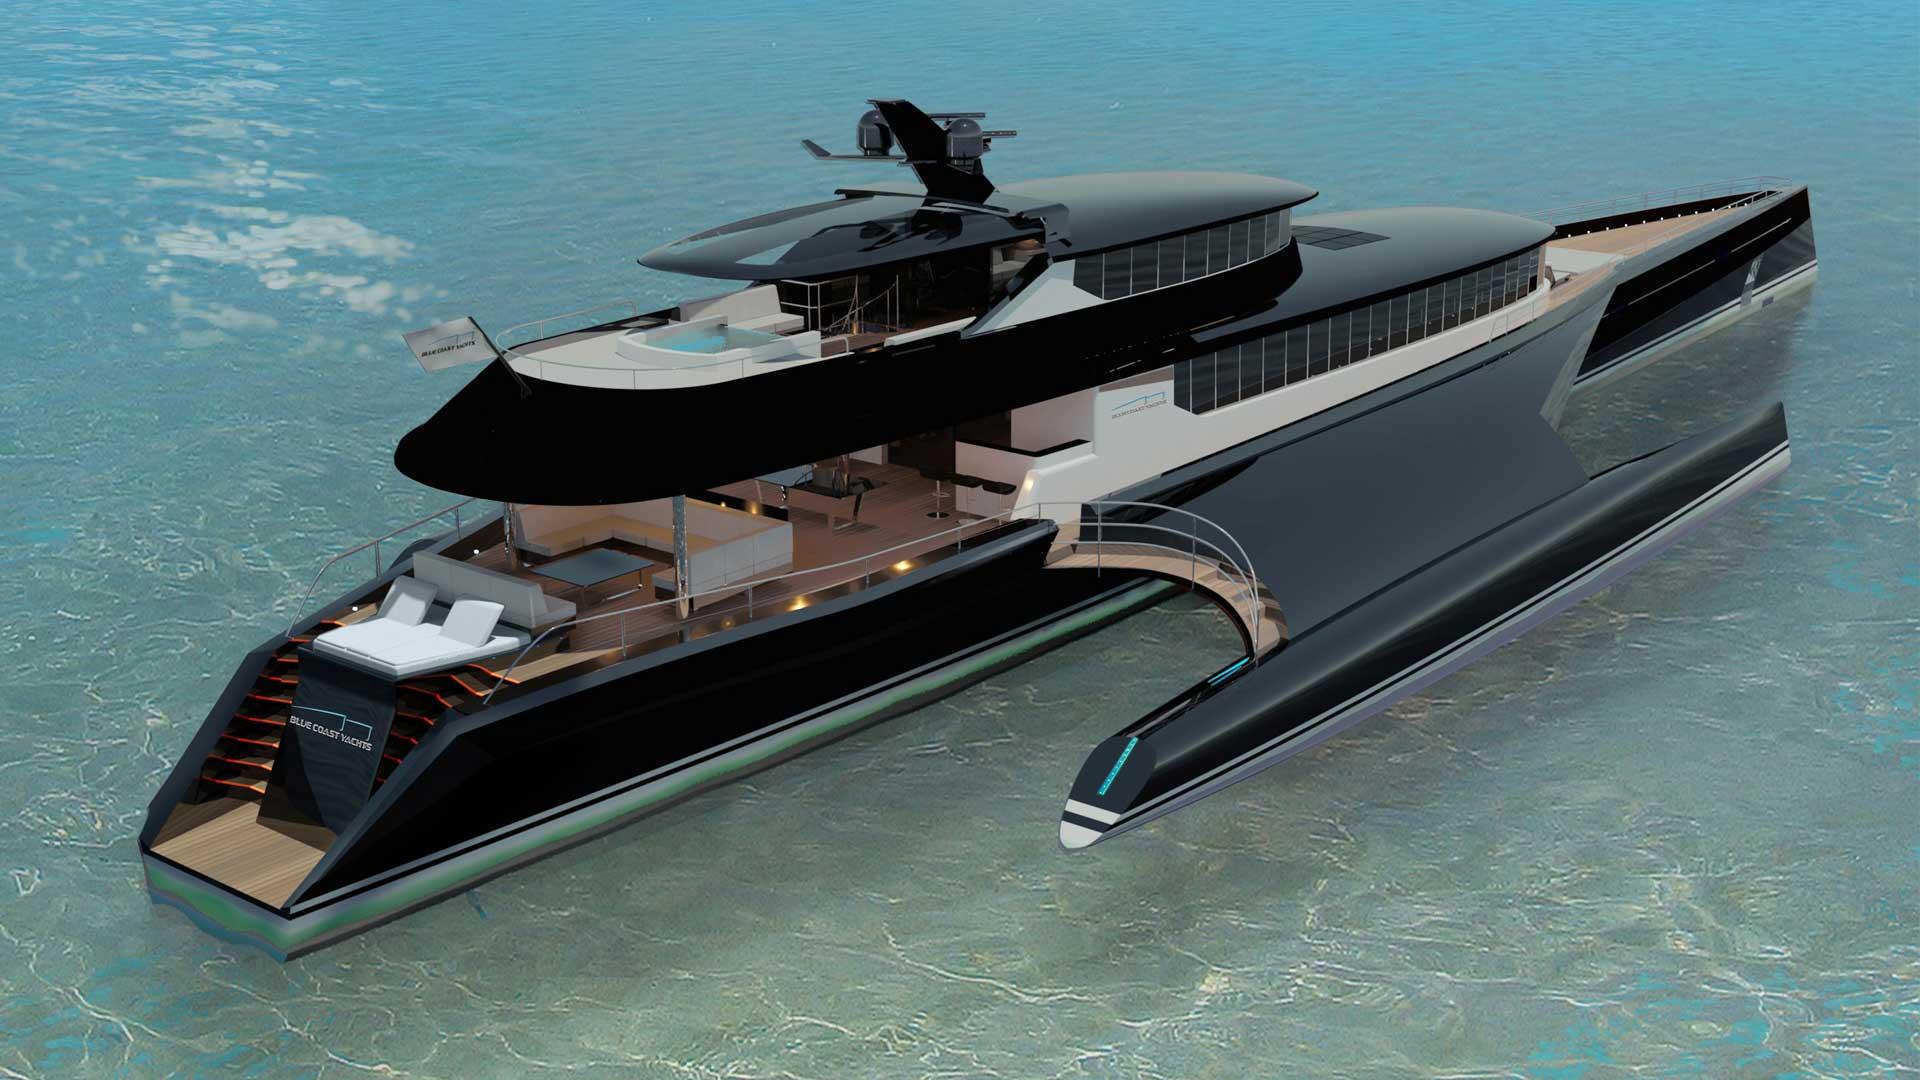 Superyacht Sunday: $47 3 Million Trimaran Superyacht by Blue Coast